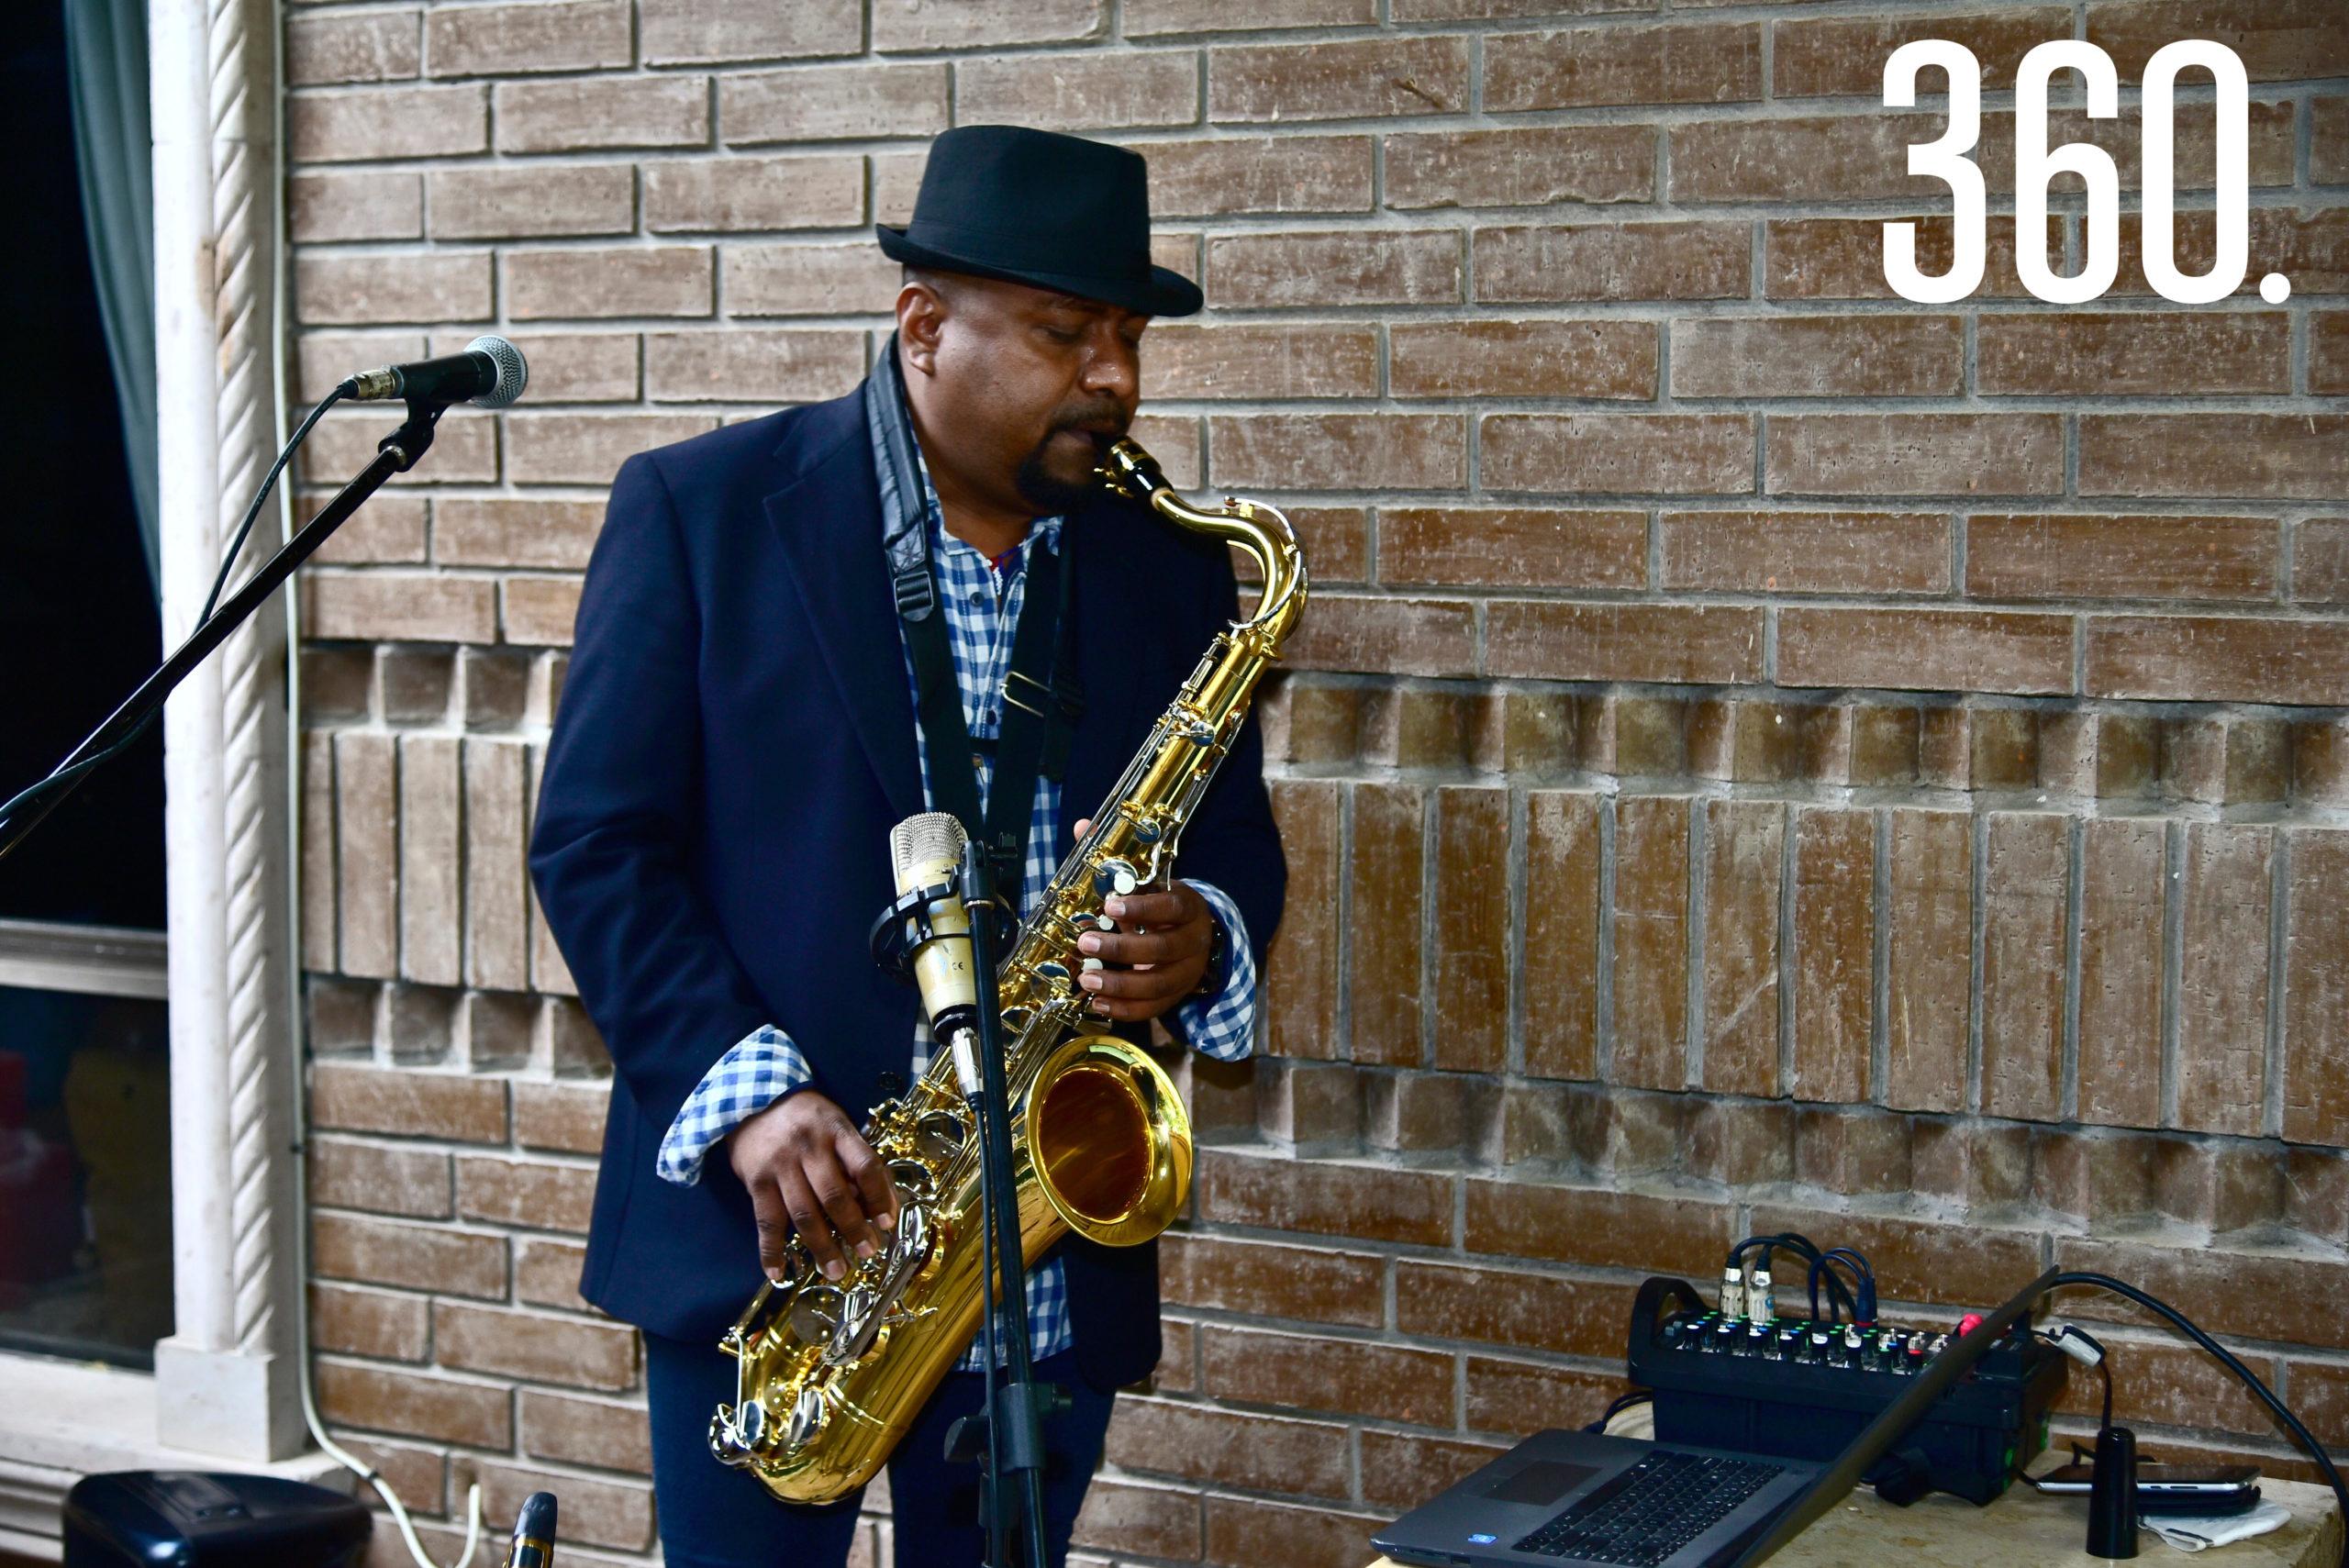 Un saxofonista tocó algunas melodías.